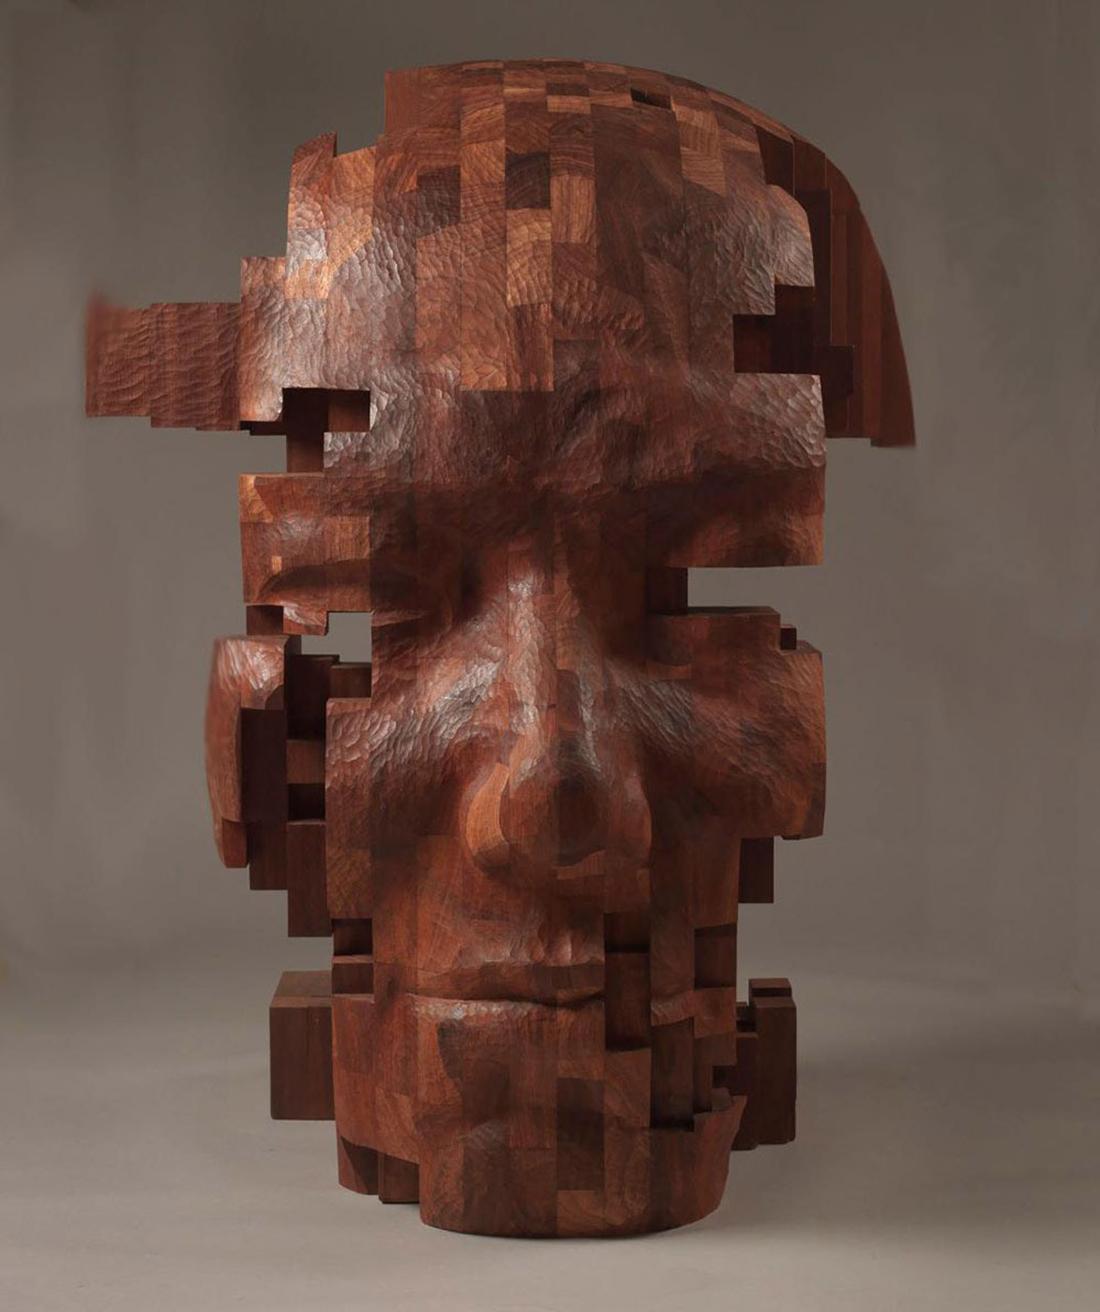 Crea.Tips - Art - Sculpture - Wood - Pixelations - Hsu Tang Han - Ahşap Figuratif Heykeller